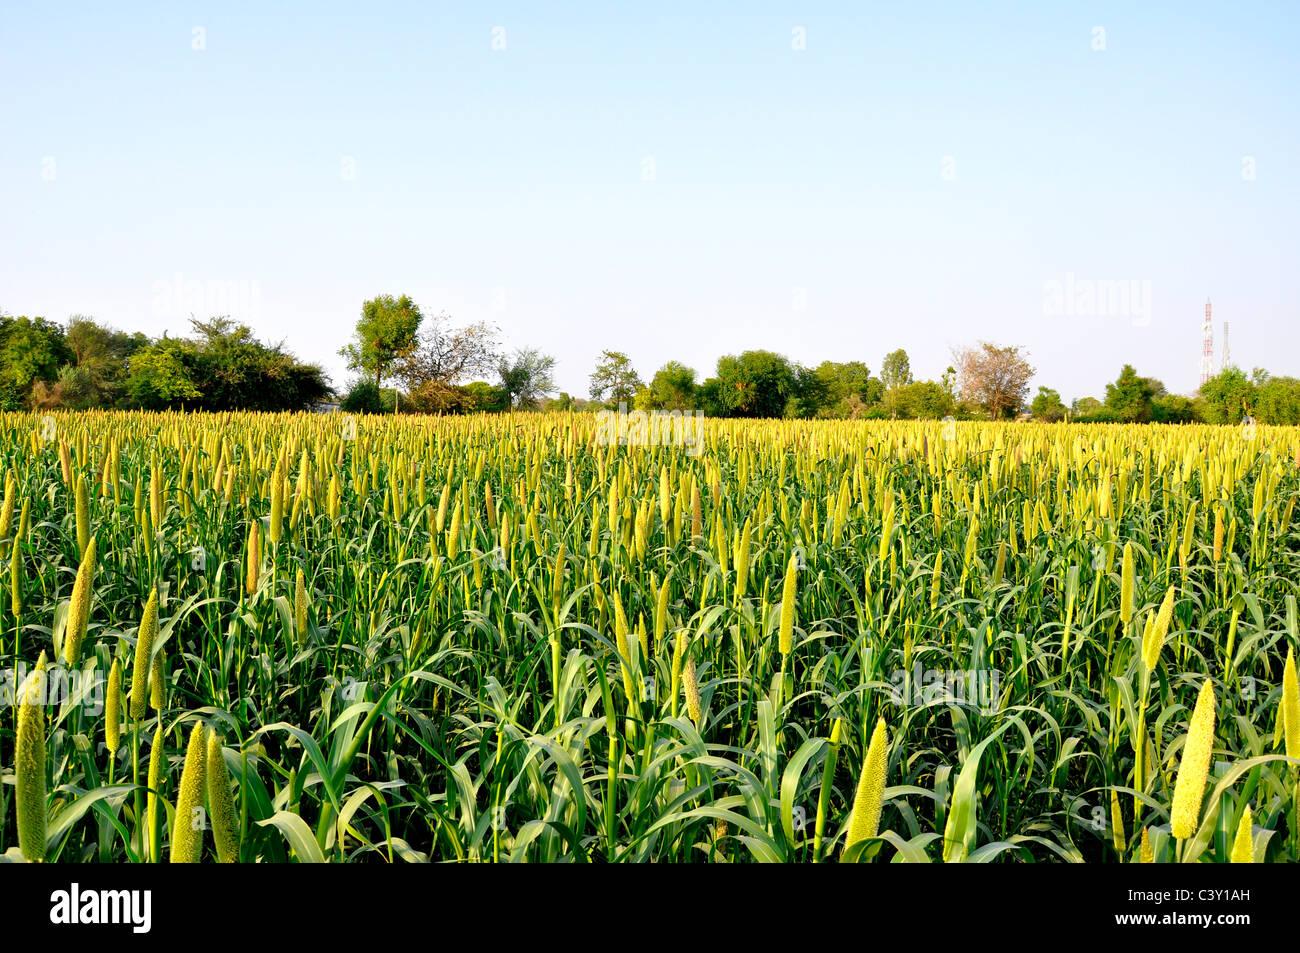 Pearl millet (Pennisetum glaucum) cultivation in india - Stock Image